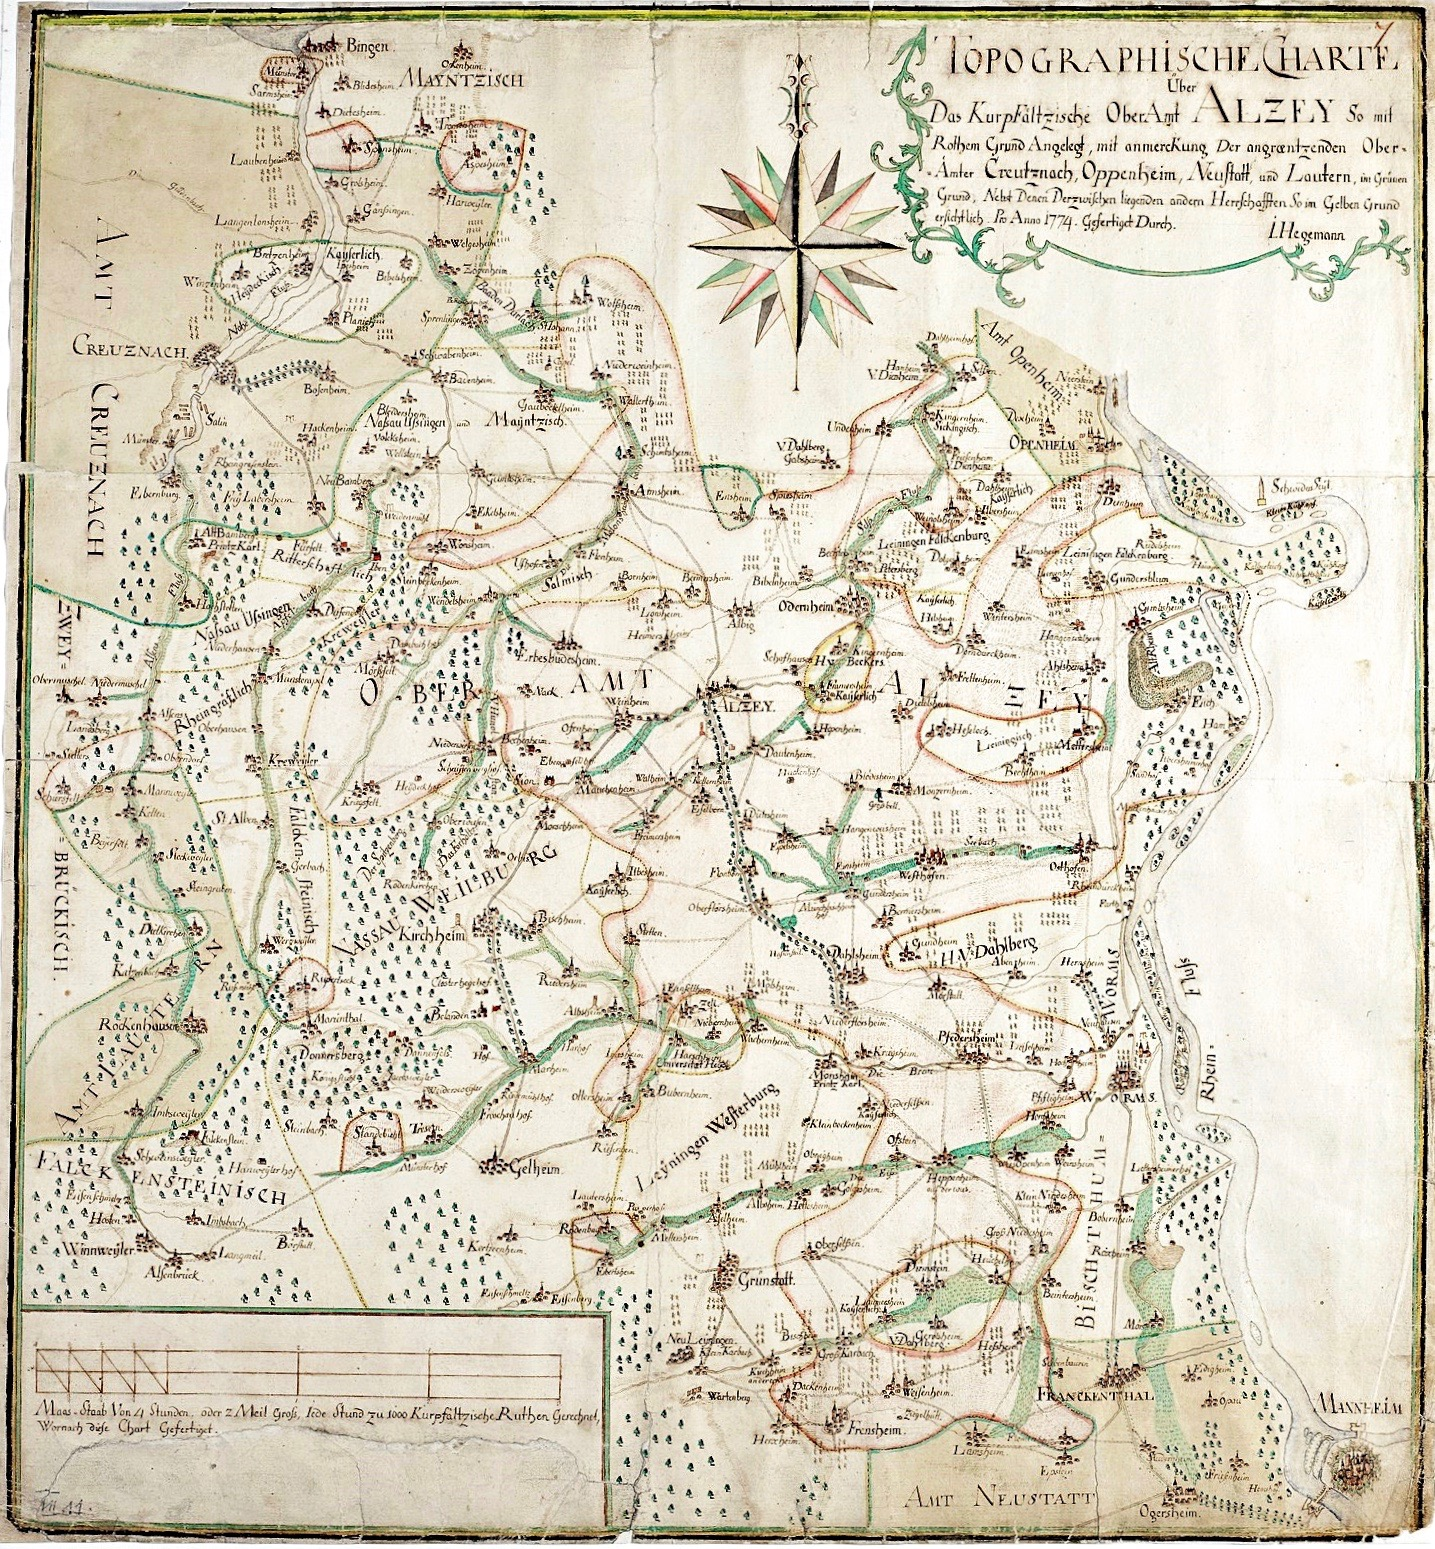 1774: Oberamt Alzey